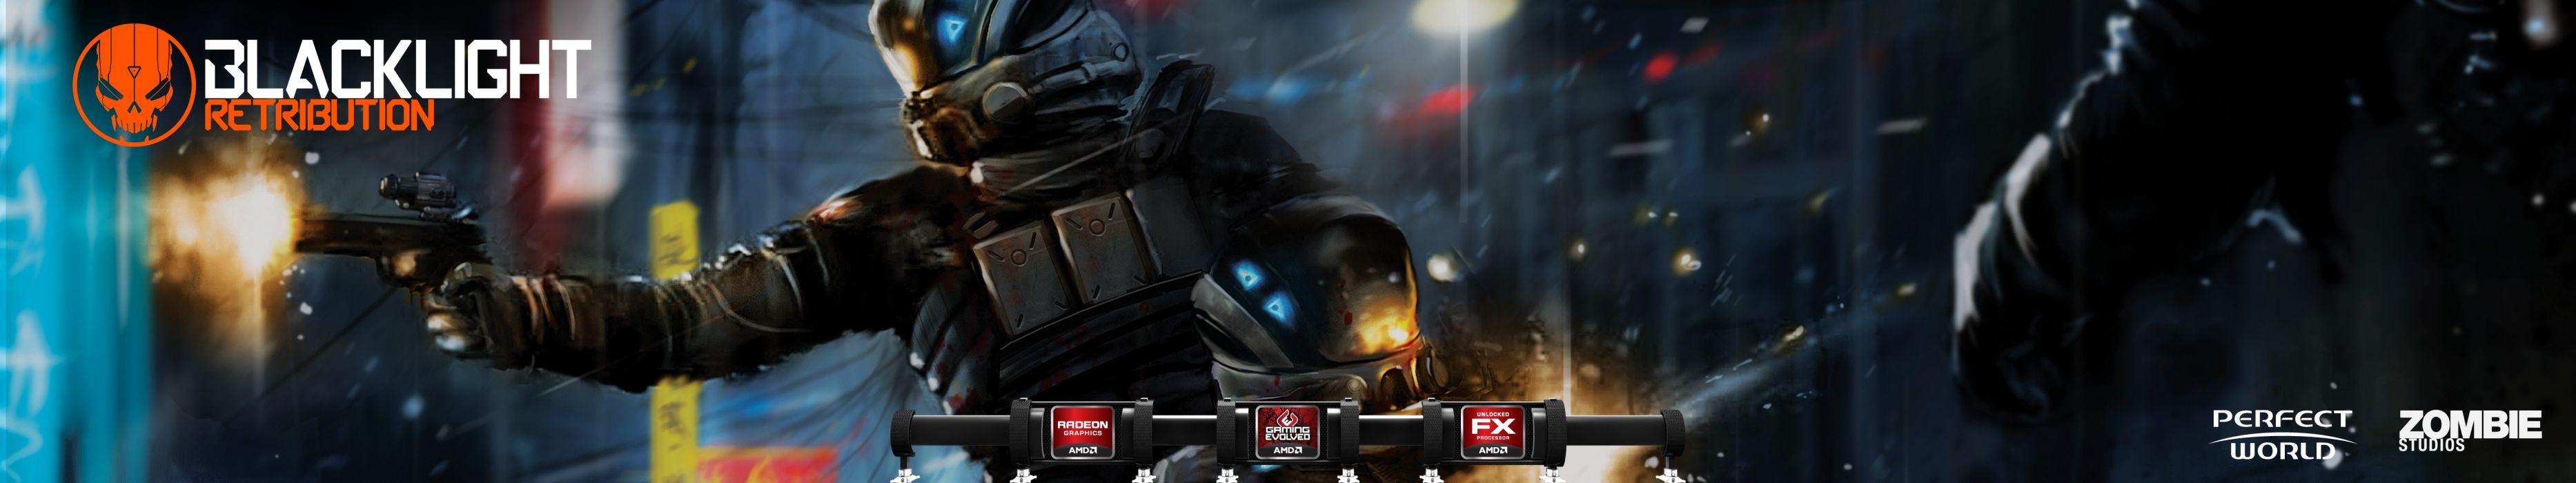 BLACKLIGHT RETRIBUTION sci-fi game  h wallpaper